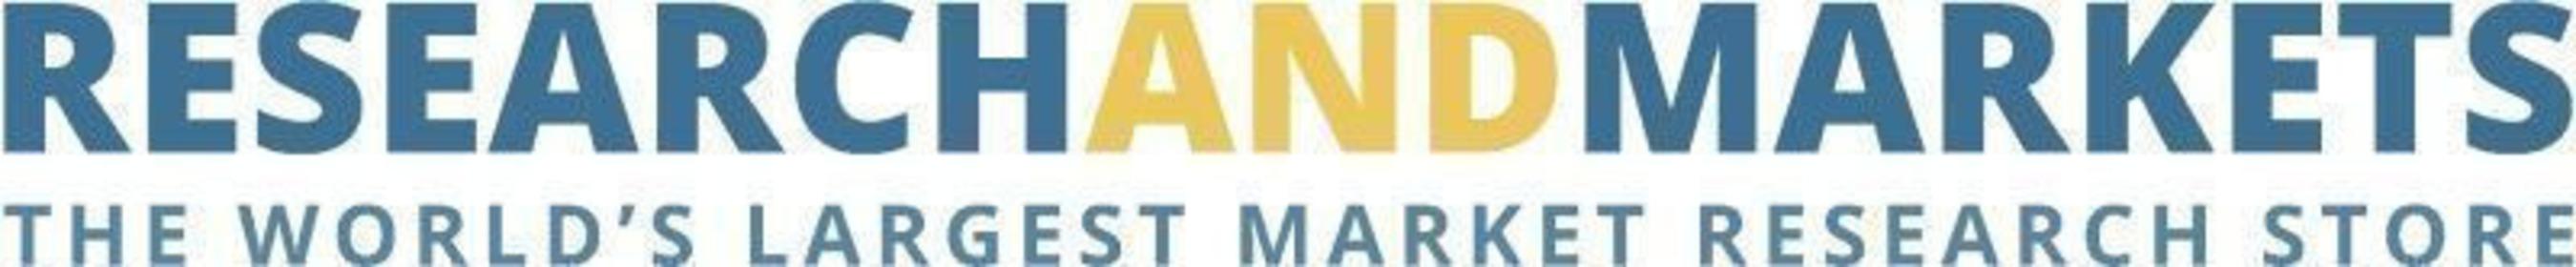 Research and Markets Logo. (PRNewsFoto/PR NEWSWIRE EUROPE)